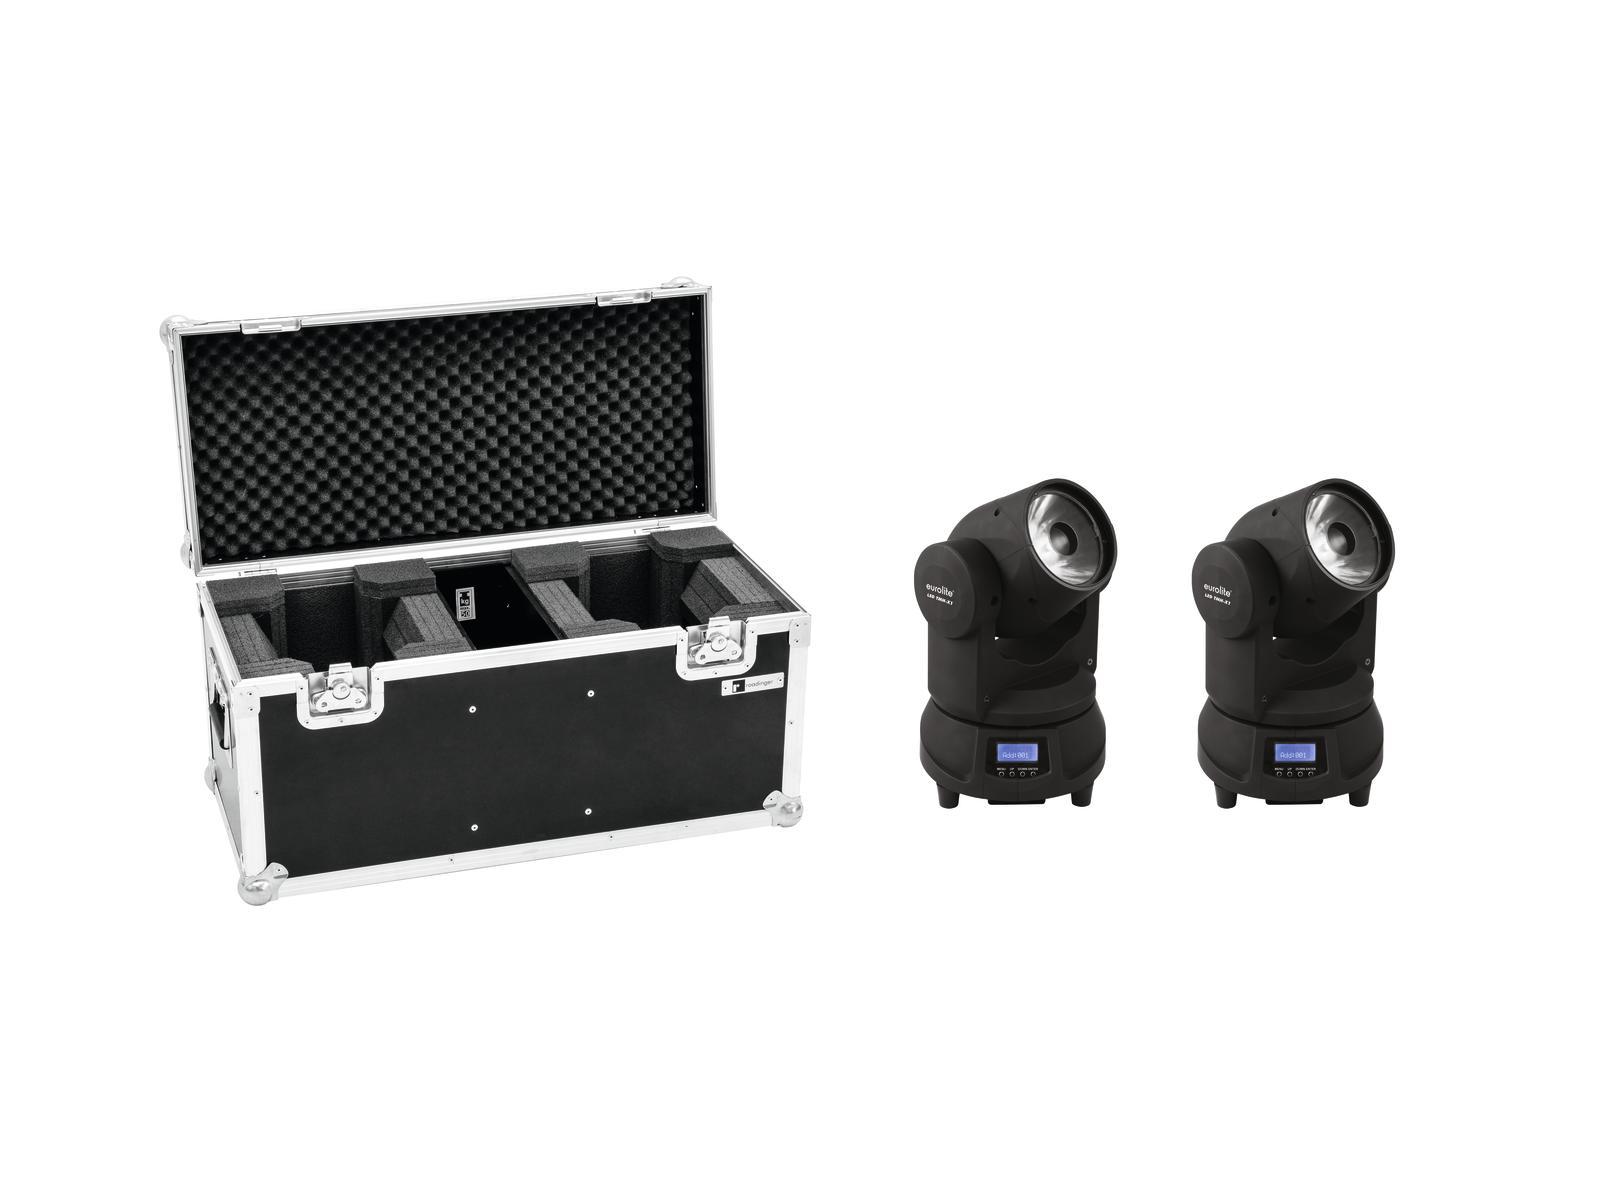 eurolite-set-2x-led-tmh-x1-moving-head-beam-case